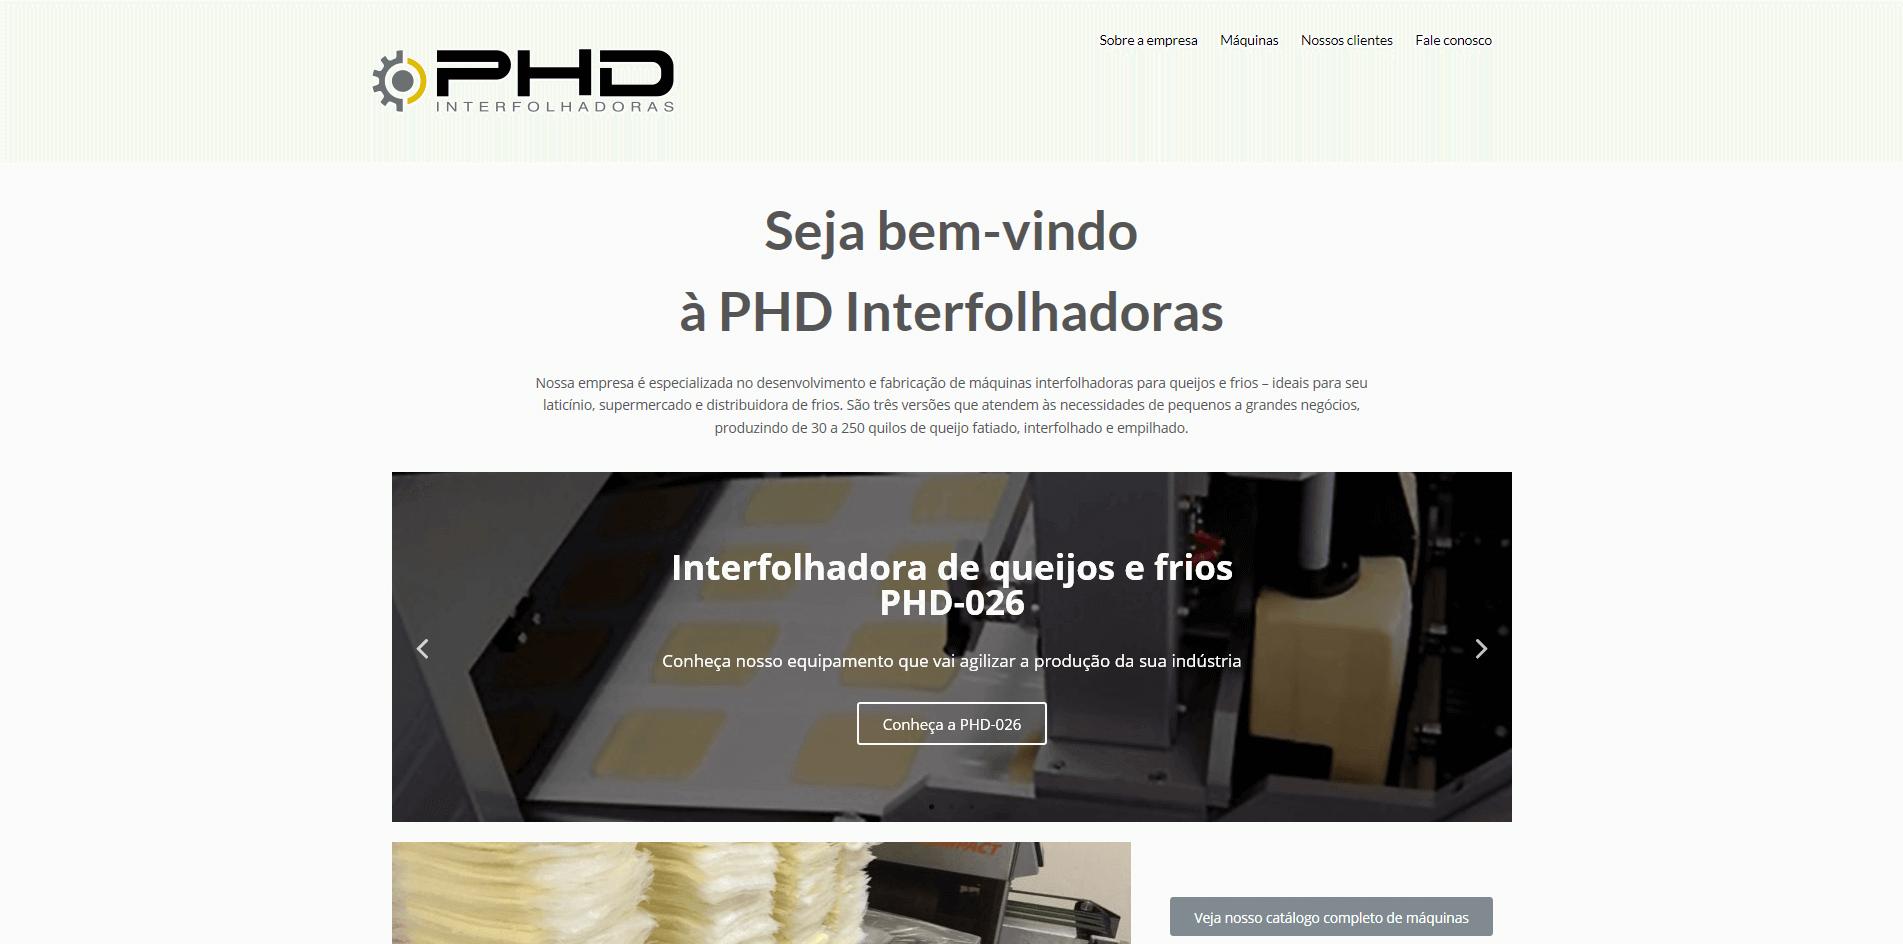 PHD Interfolhadoras